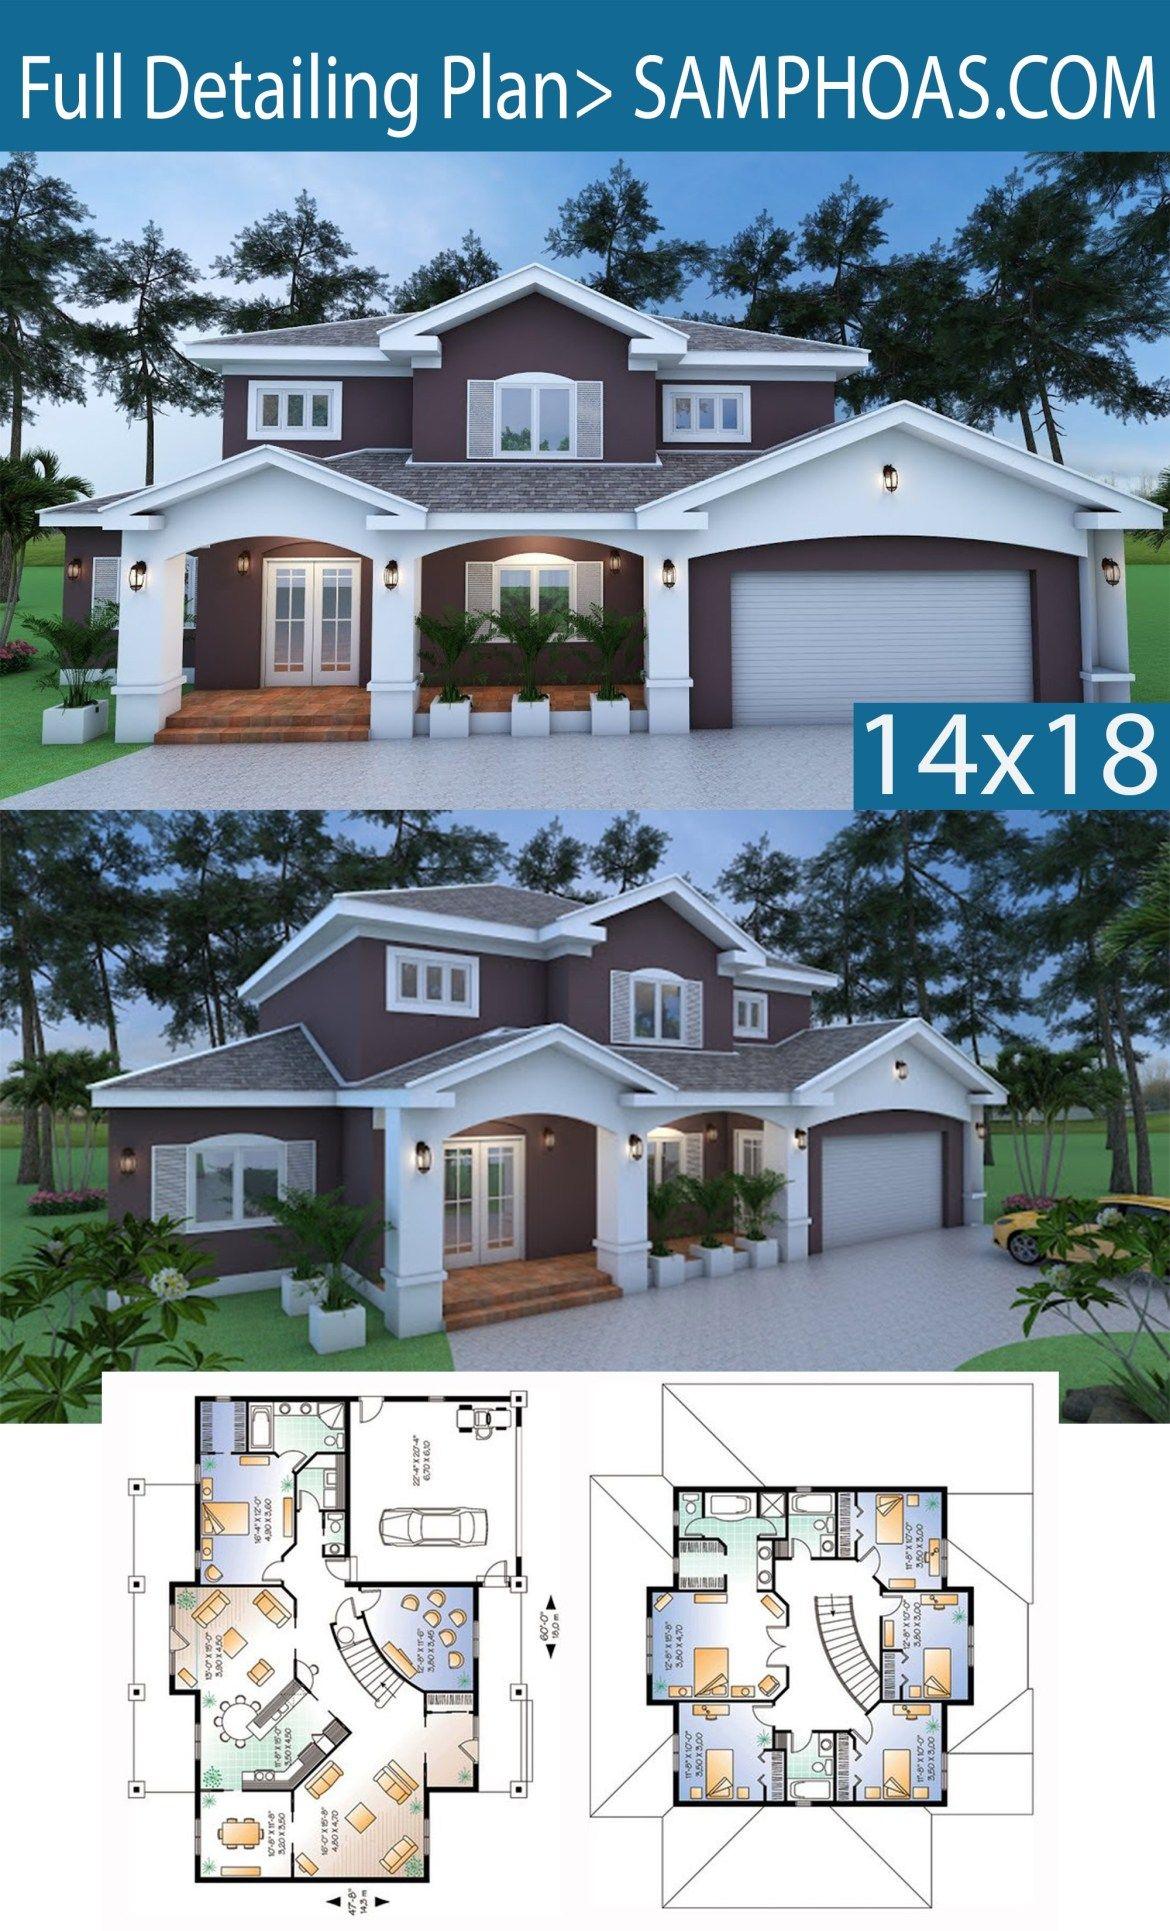 6 Bedrooms House Plan14.3x18m